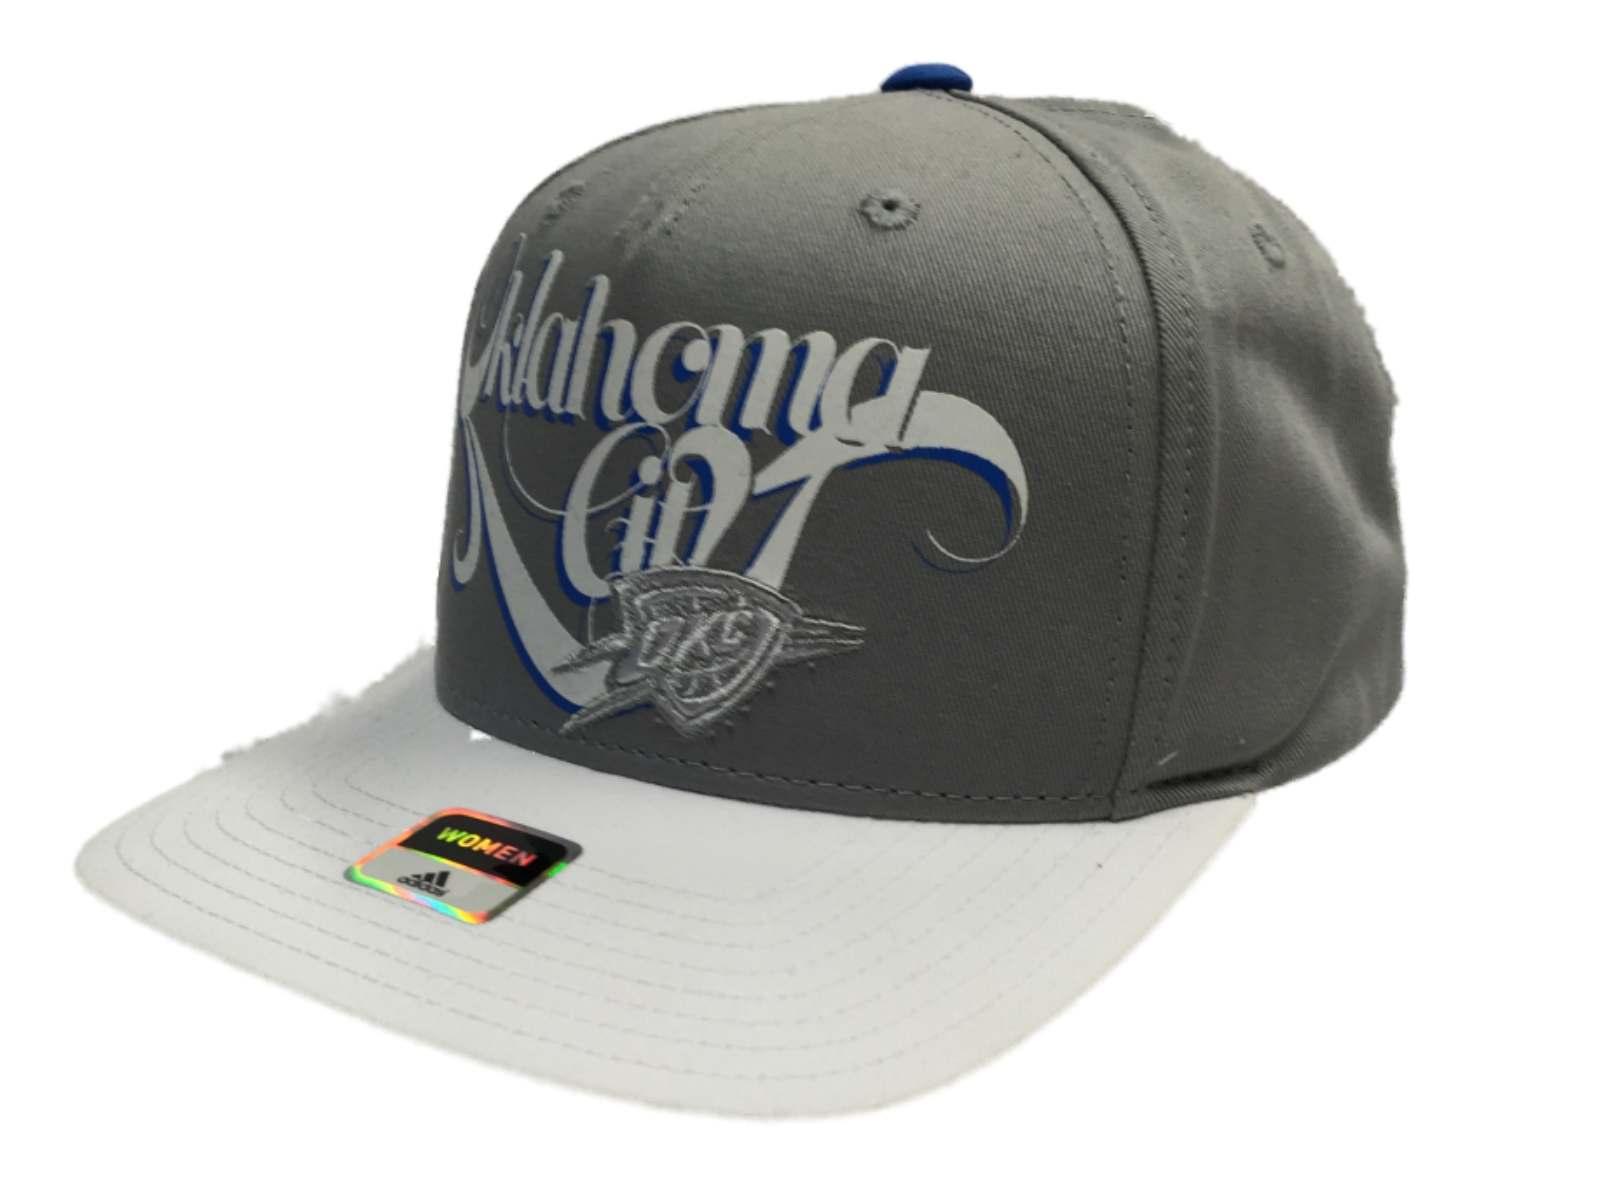 6d361c68bd328 Oklahoma City Thunder Adidas Women Flatbill Gray Adjustable Strap Hat Cap